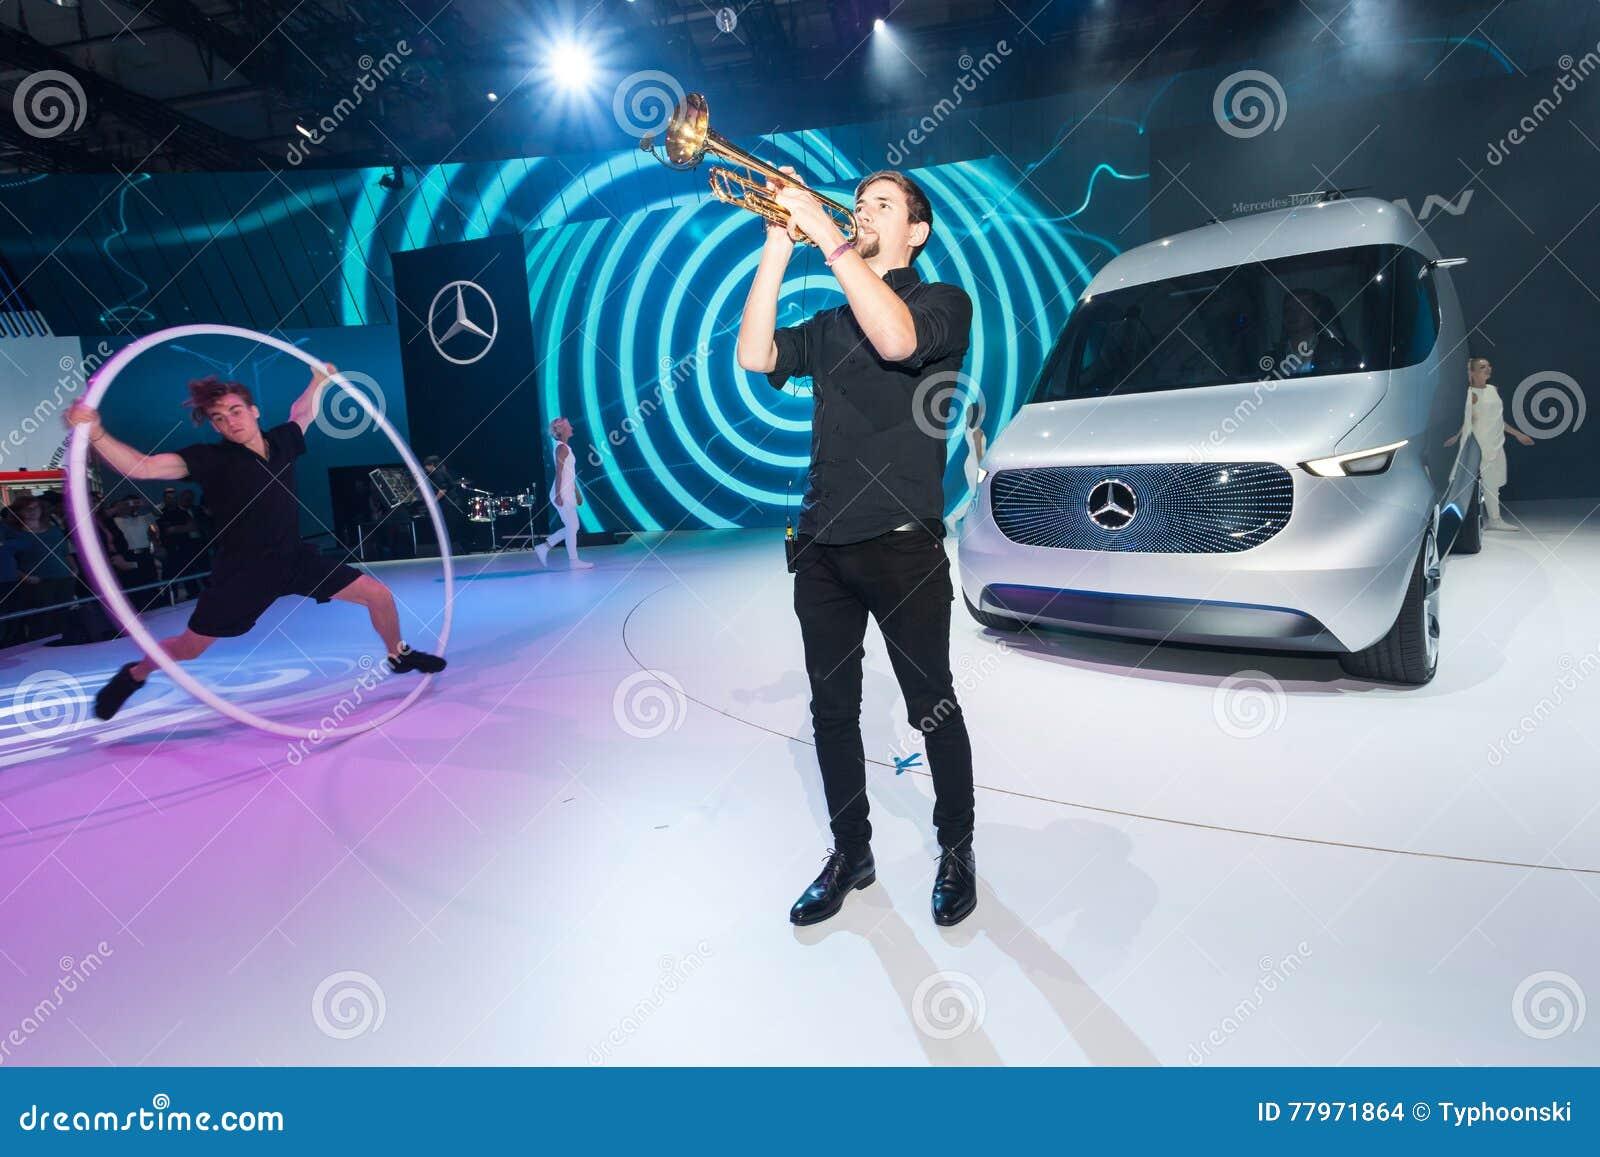 Mercedes Benz Vision Van Presentation Editorial Stock Image - Image ...